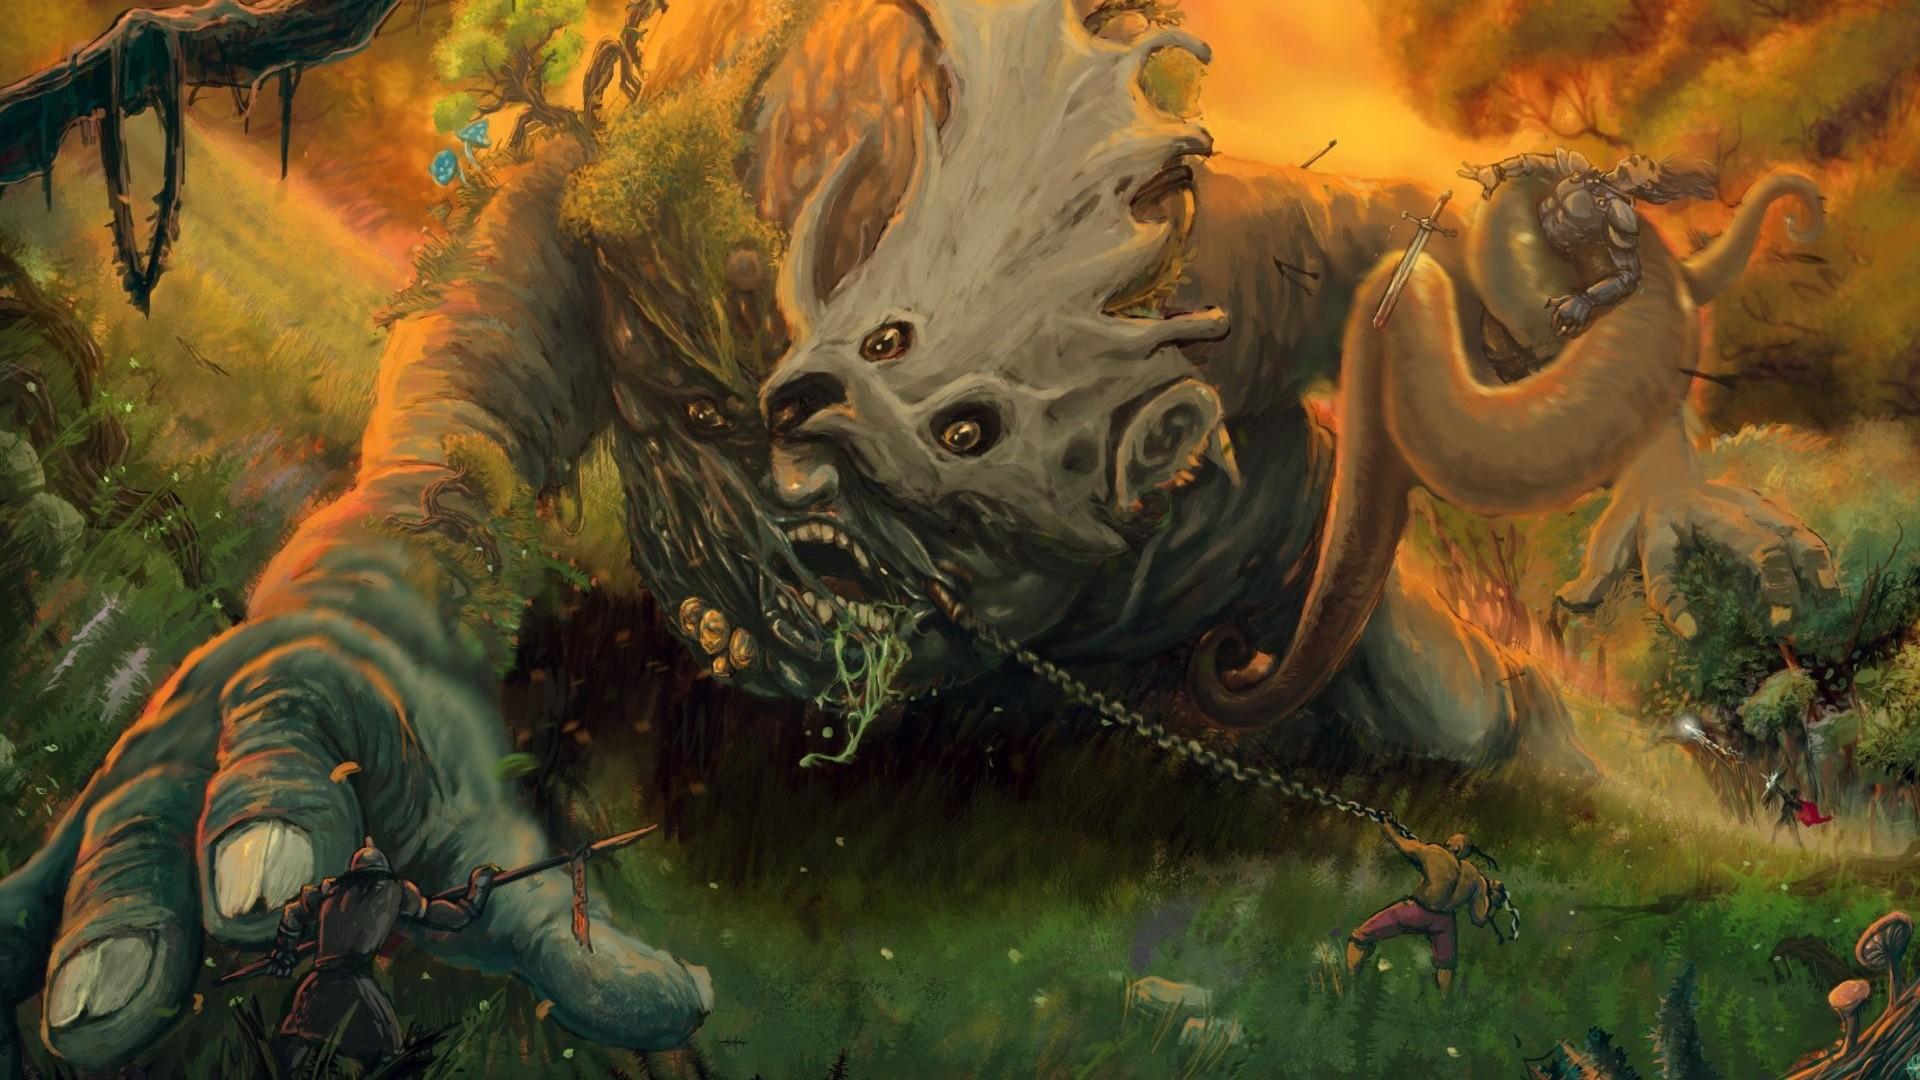 Fantasy Art Creatures HD Wallpapers